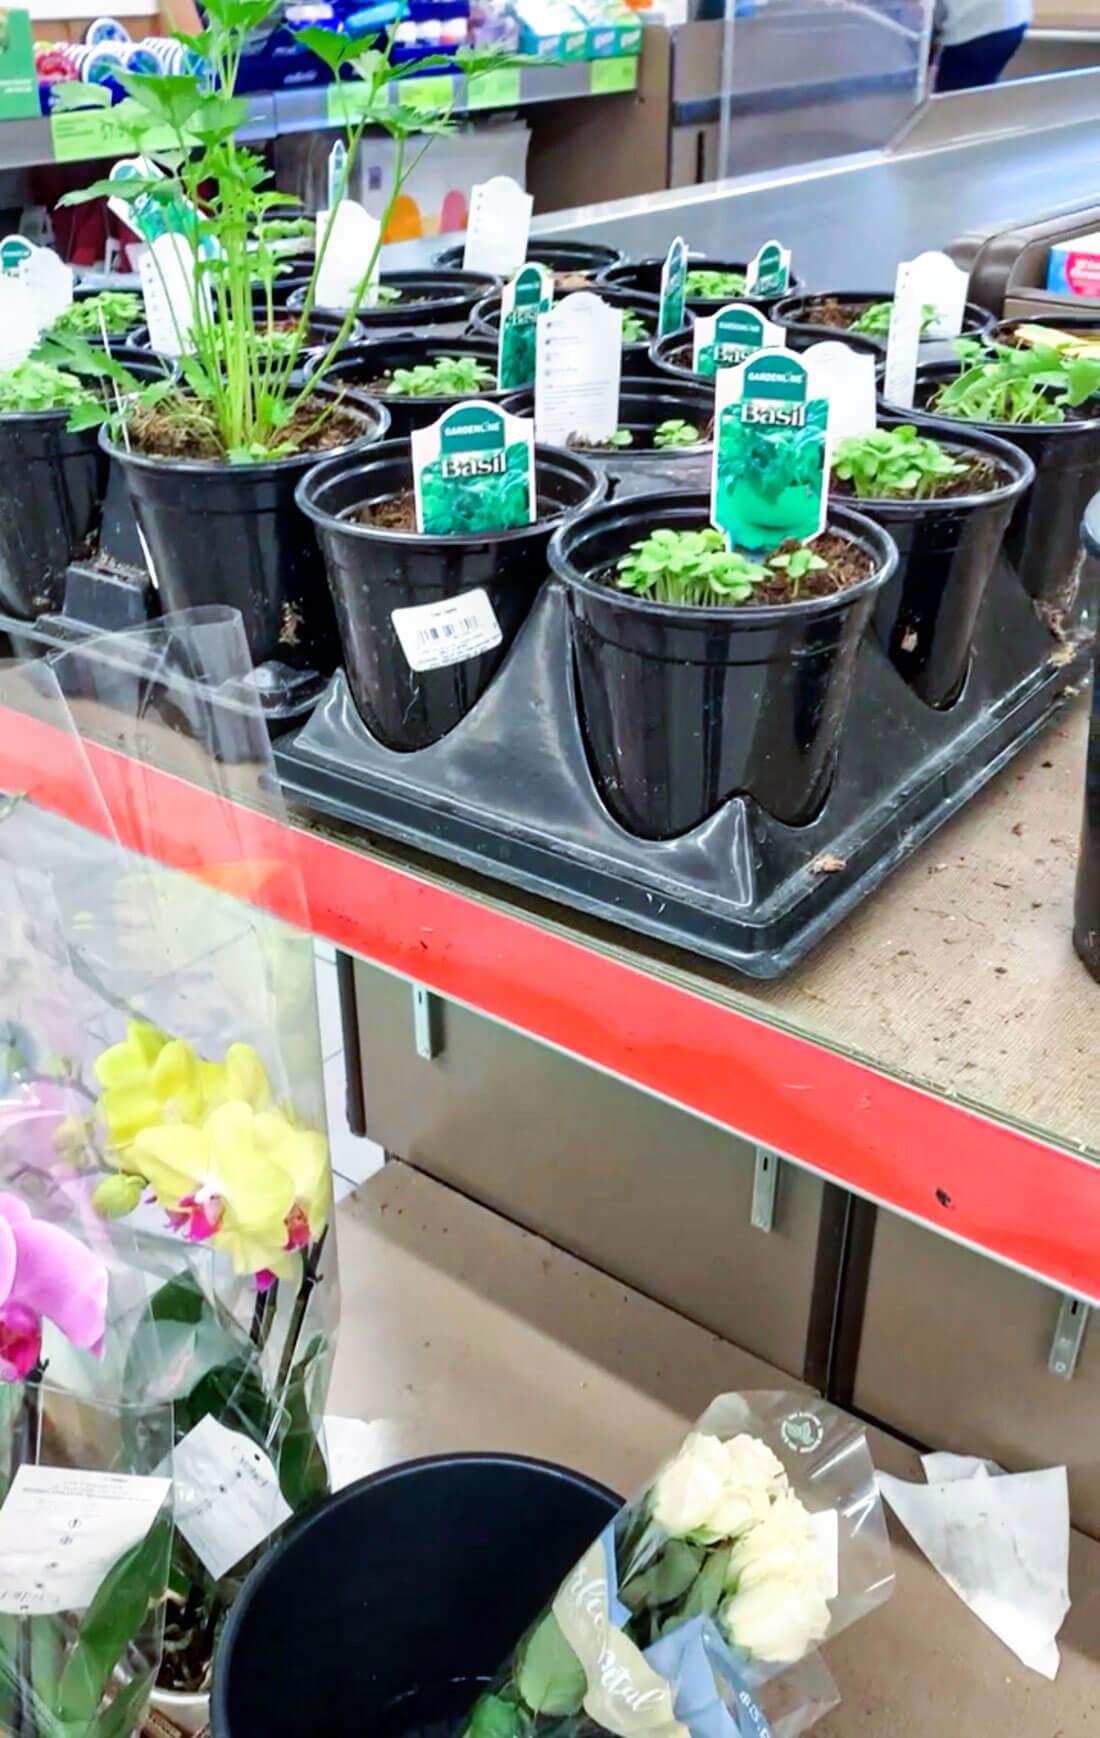 Aldi plants